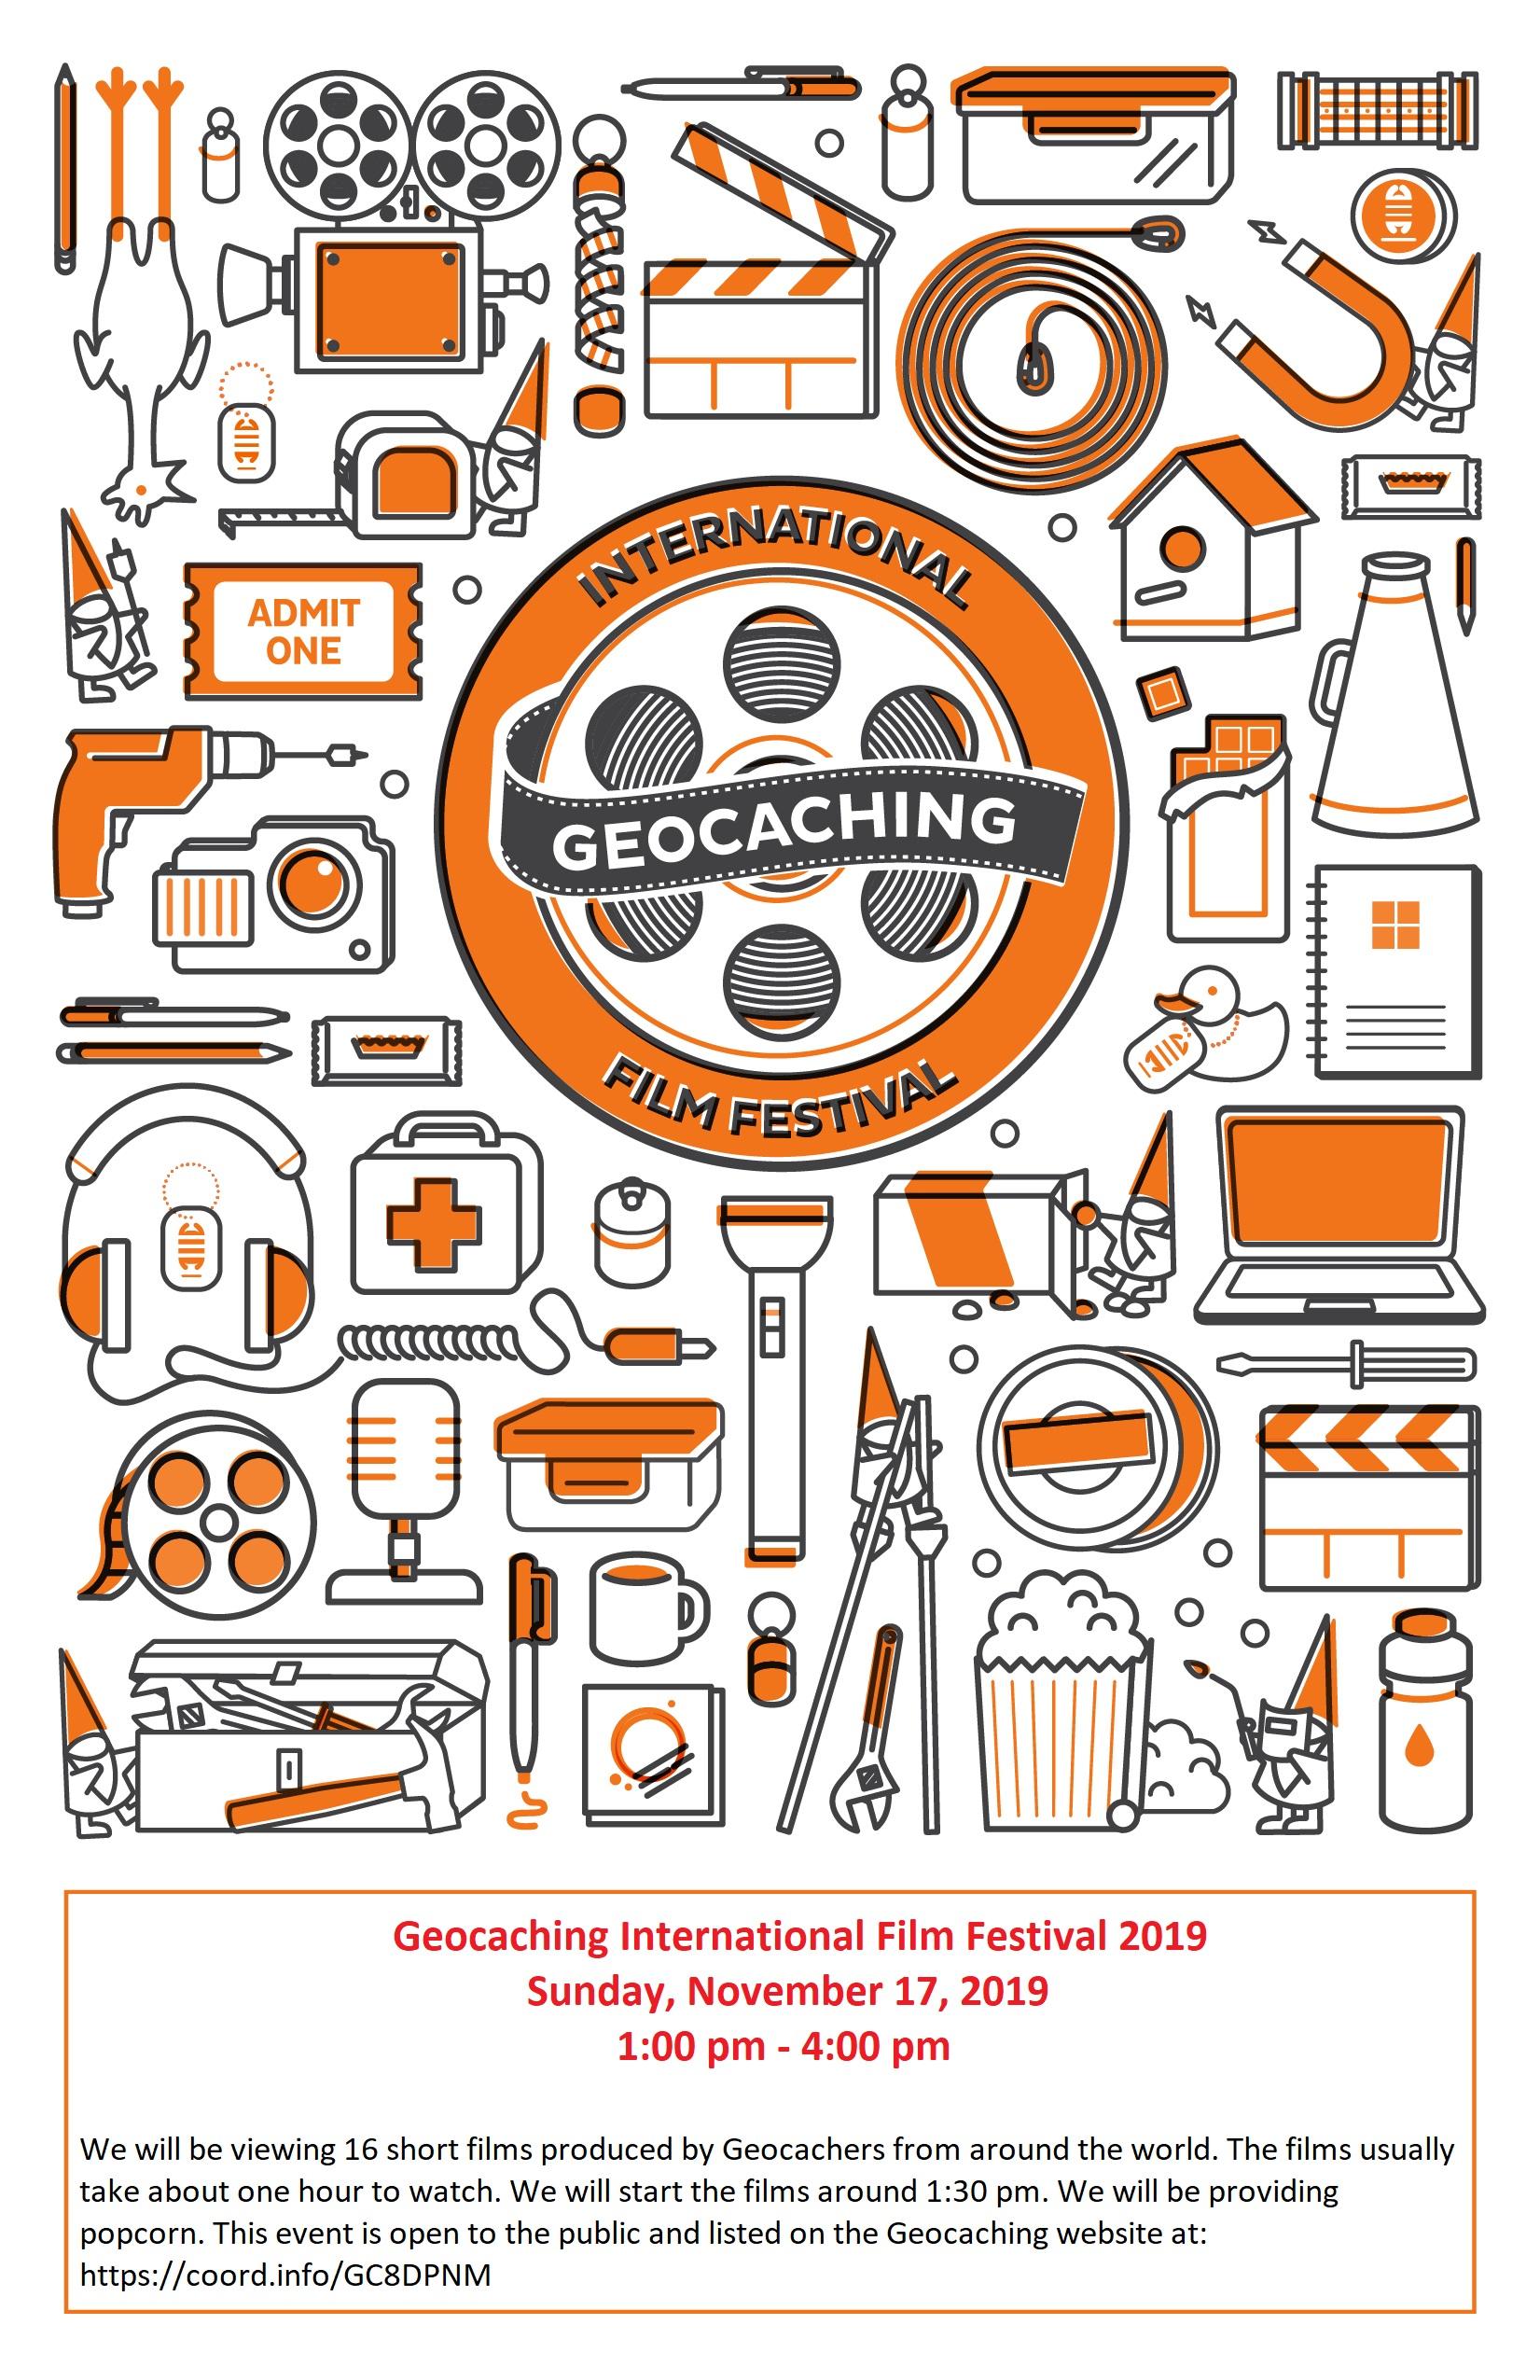 Geocaching Film Festival